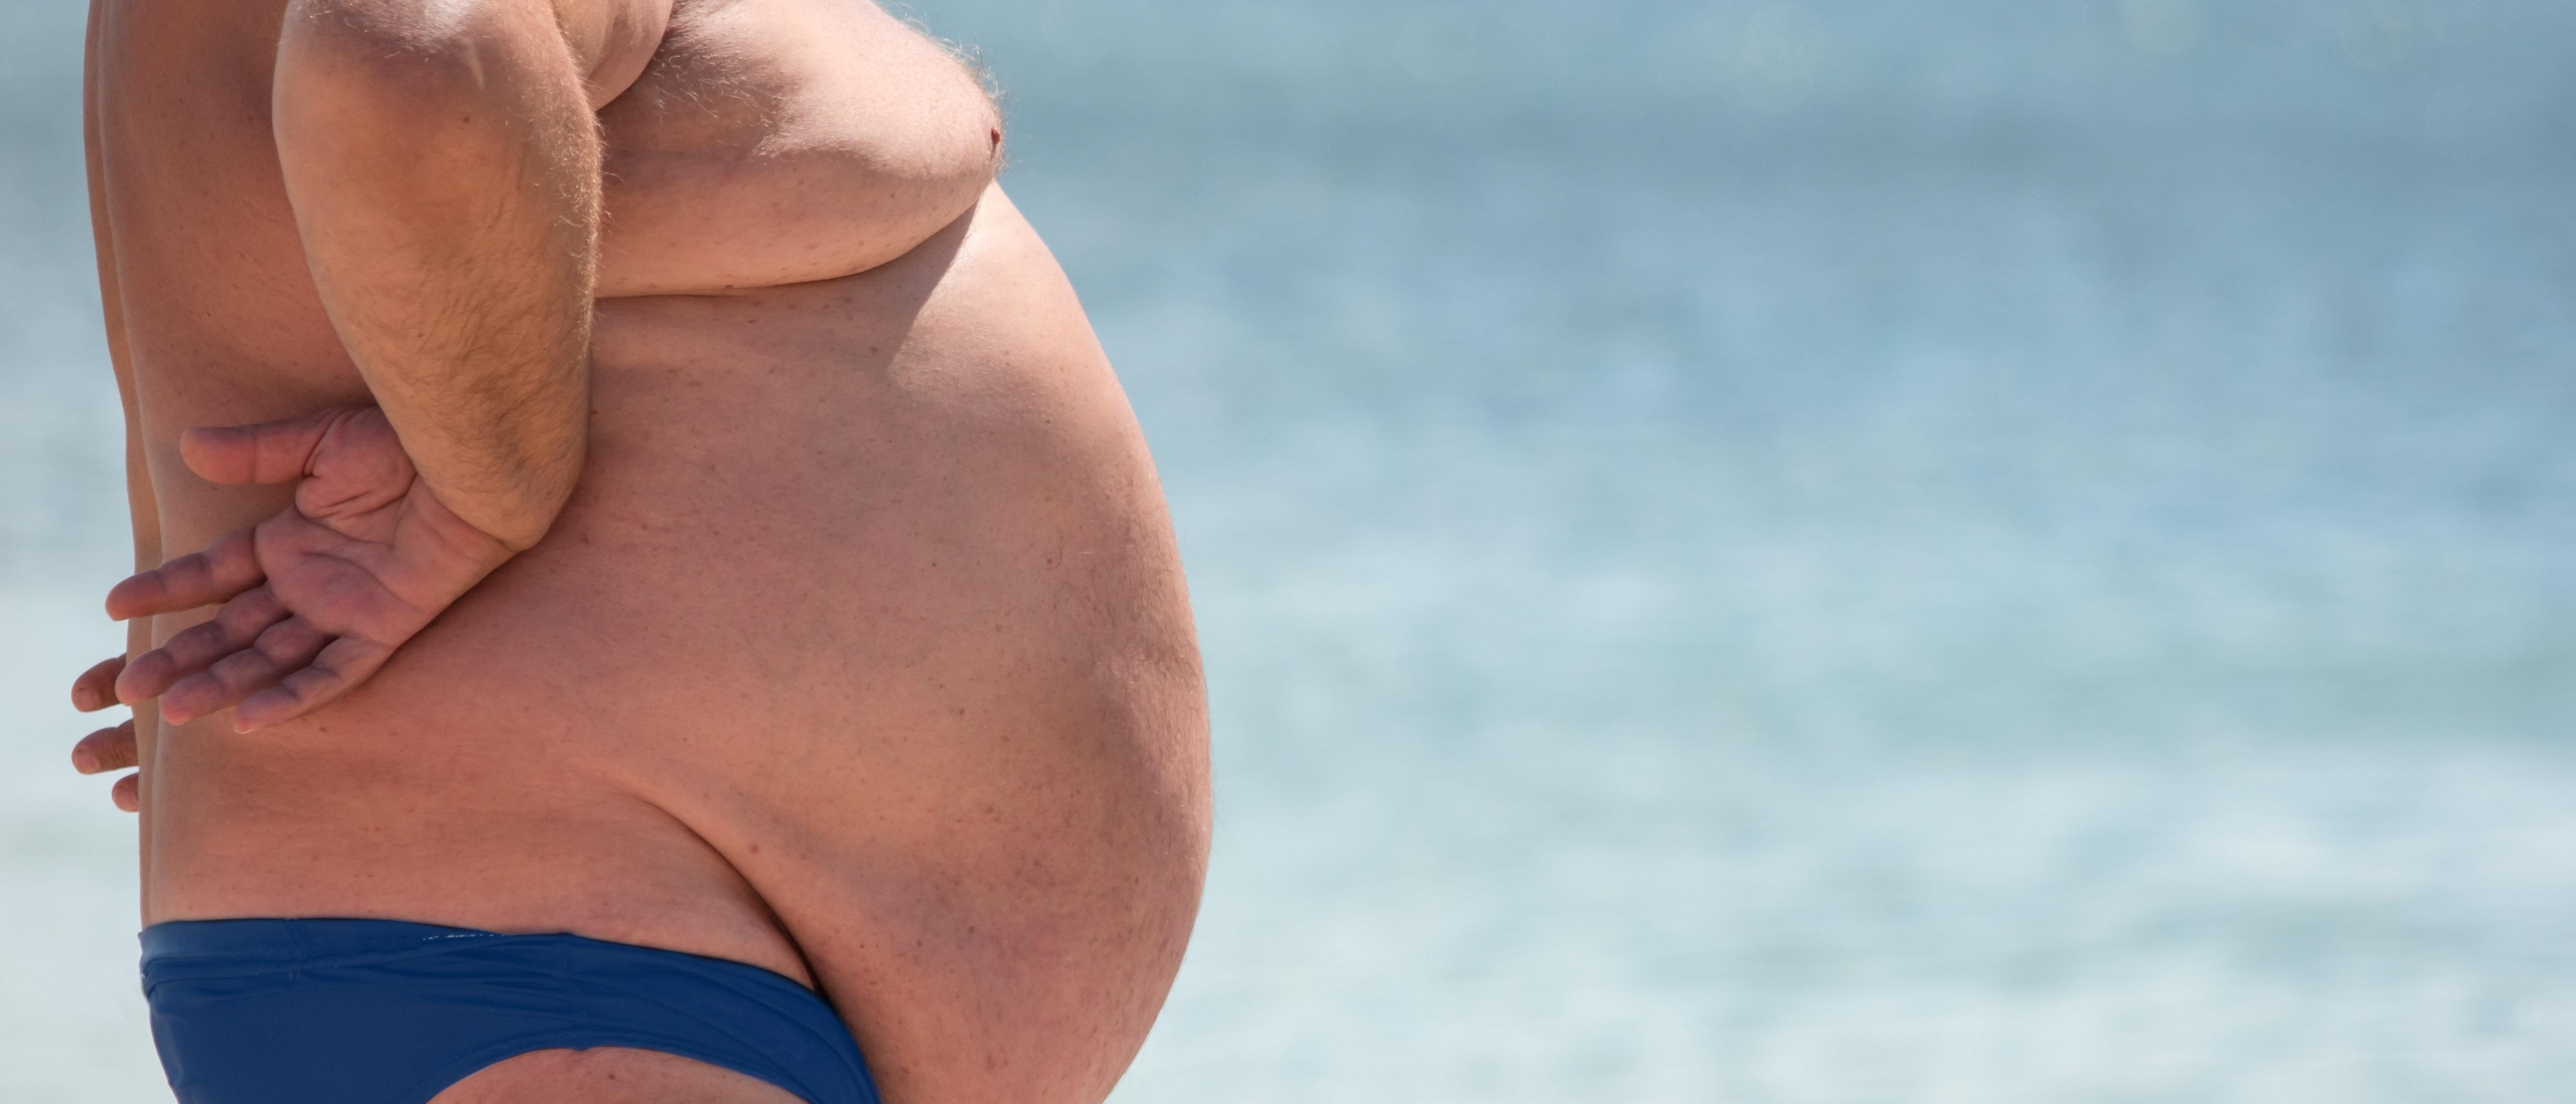 Obese man in bathing suit (Shutterstock/DenisProduction.com)